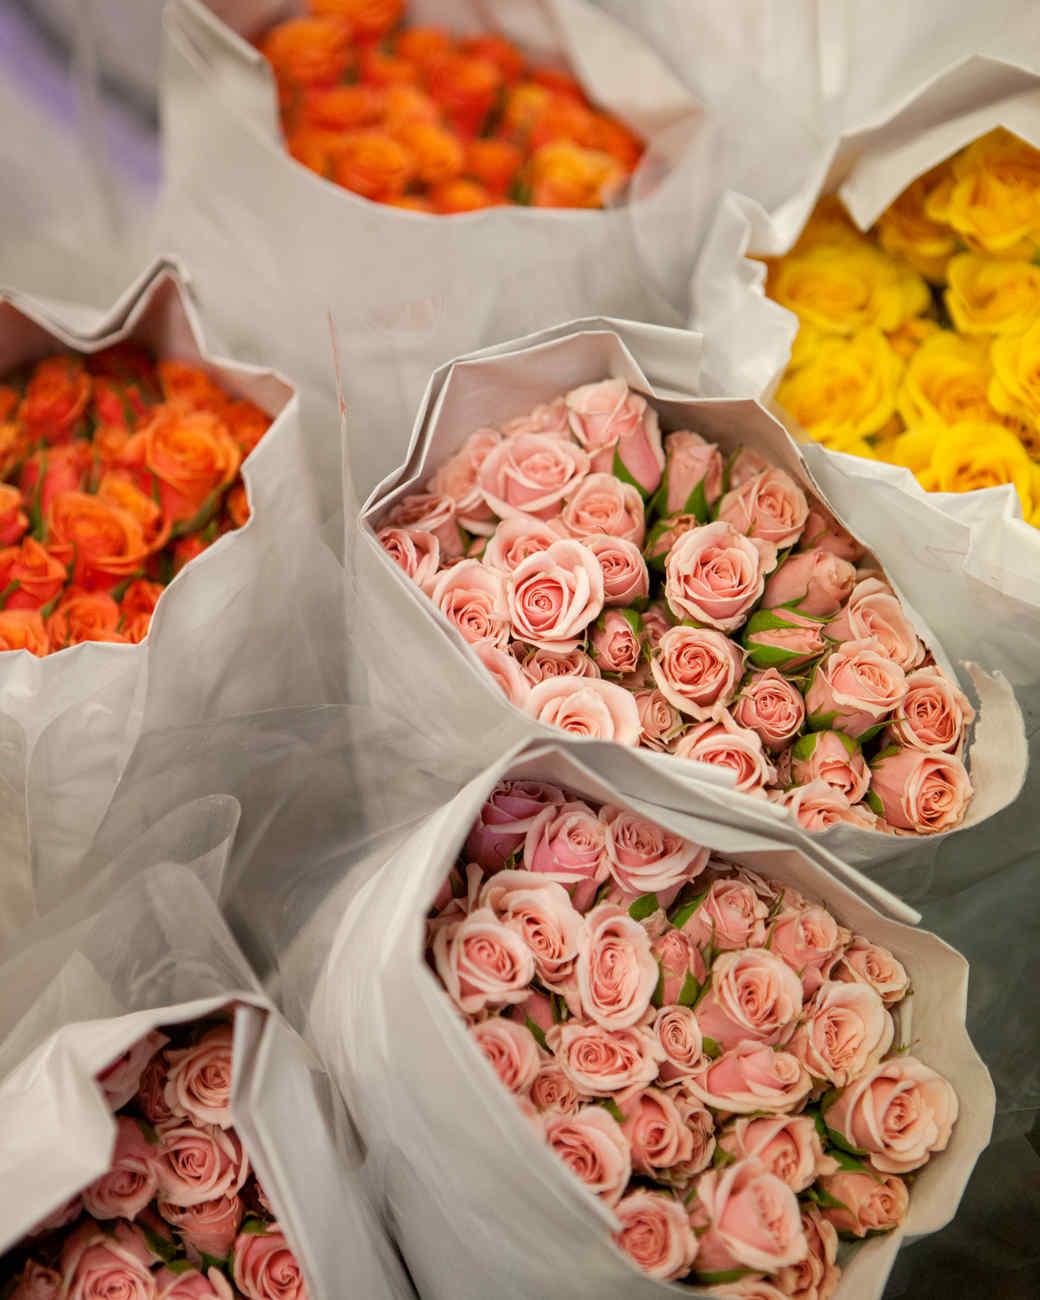 behind-the-scenes-flower-arrangement-7760-d111053.jpg